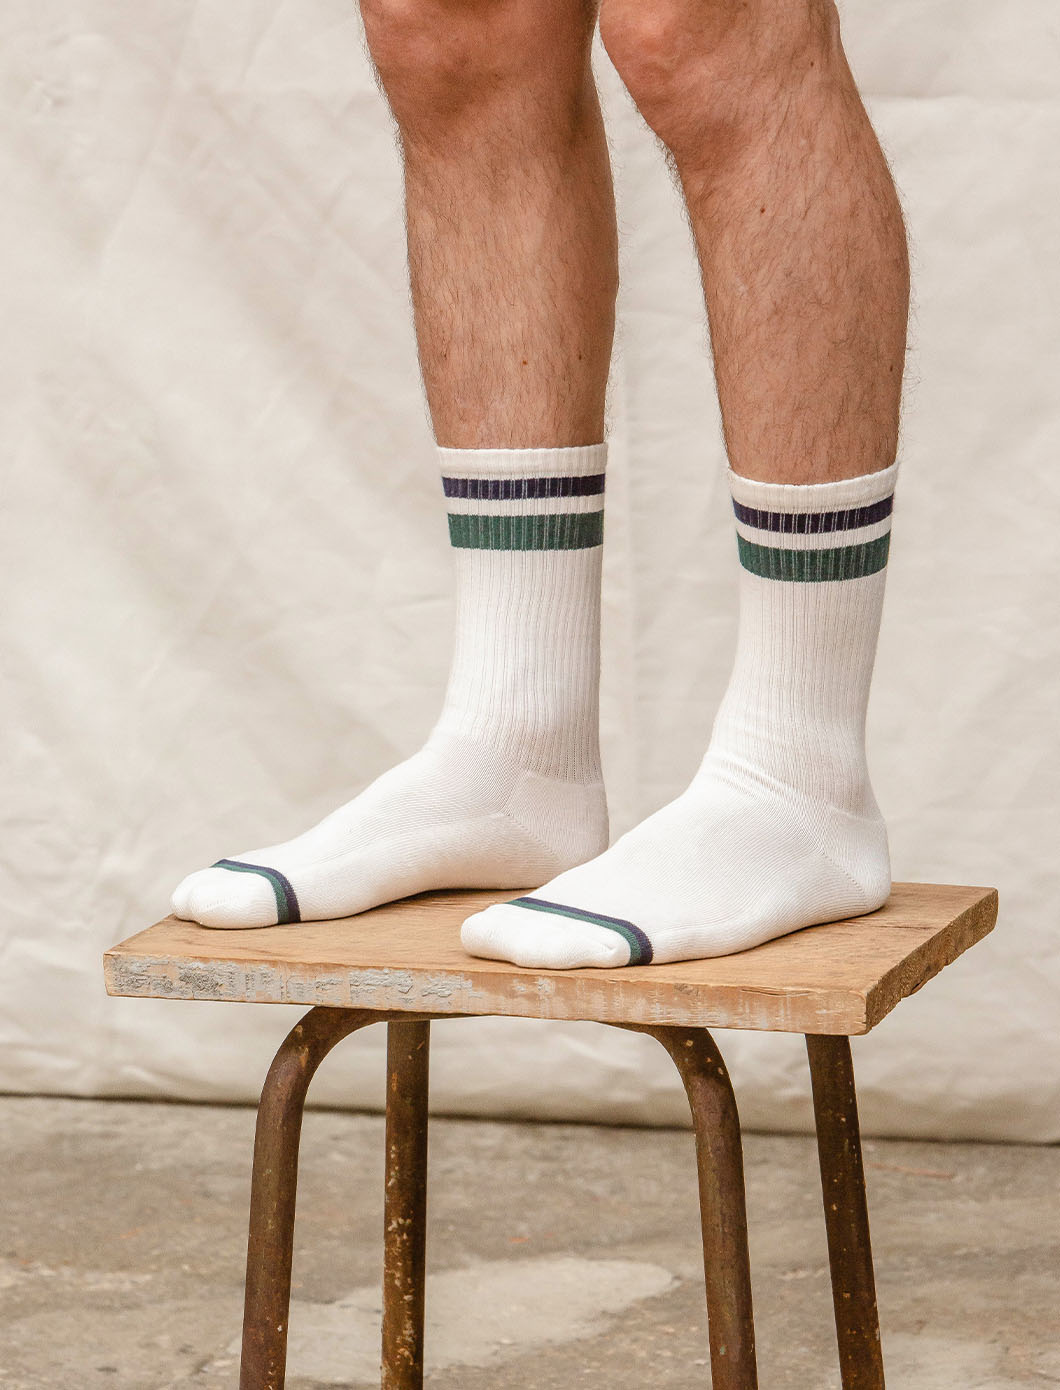 Sport Ribbed Socks - White, Navy and Fir Green